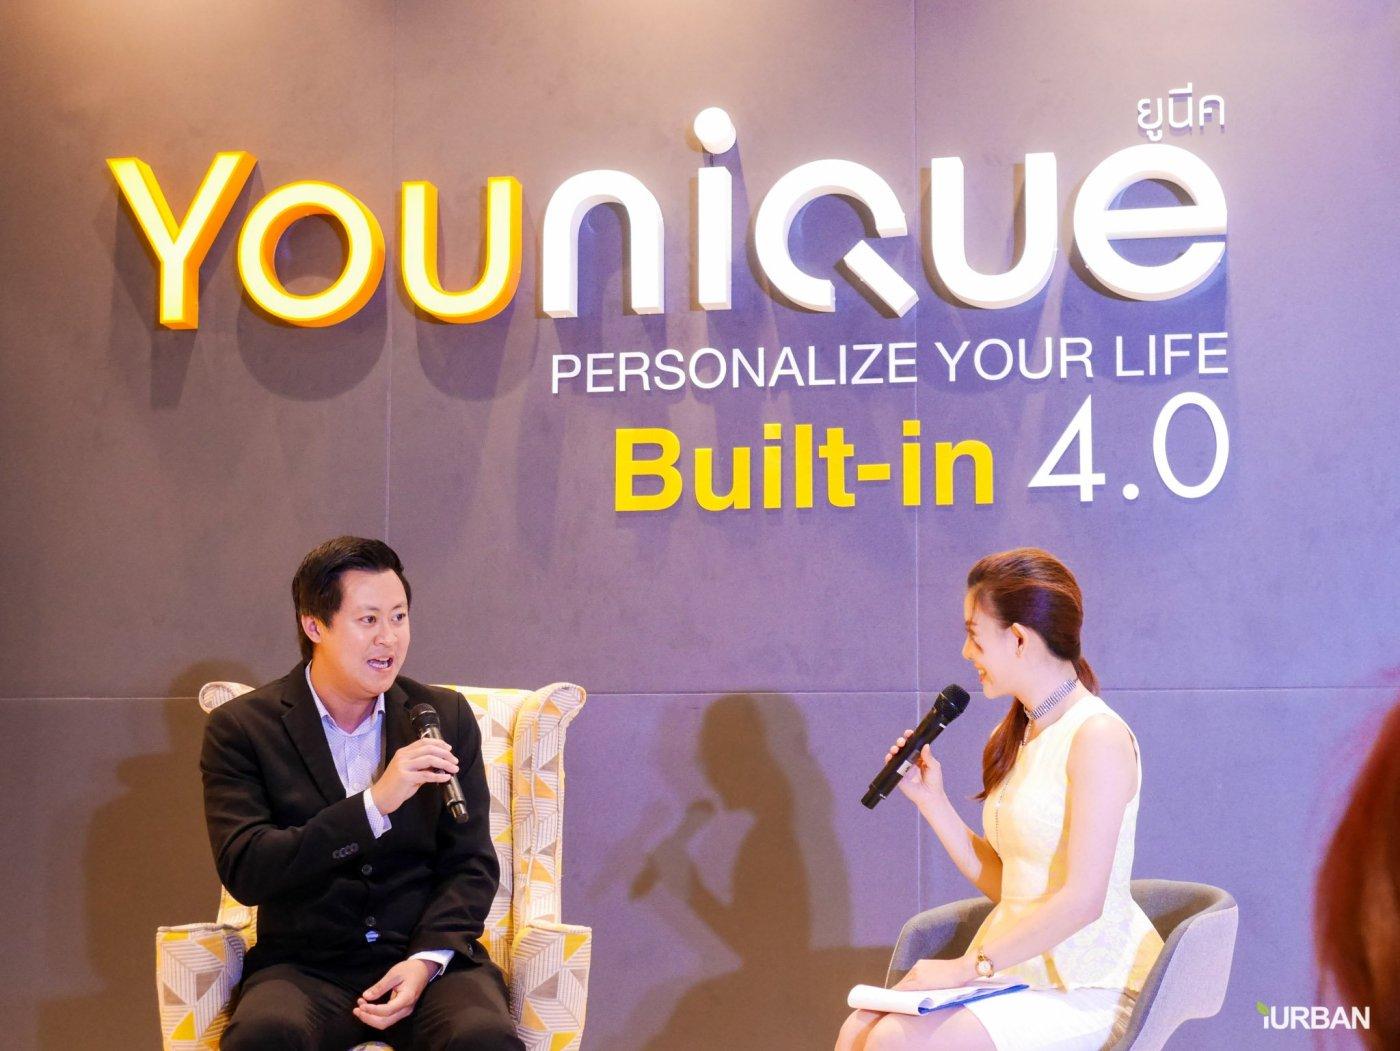 Younique เทคโนโลยีบิวท์อิน 4.0 ครั้งแรกในไทย มีเป็นล้านดีไซน์ รู้ราคาใน 1 นาที โดย Index Livingmall 13 - Built-in